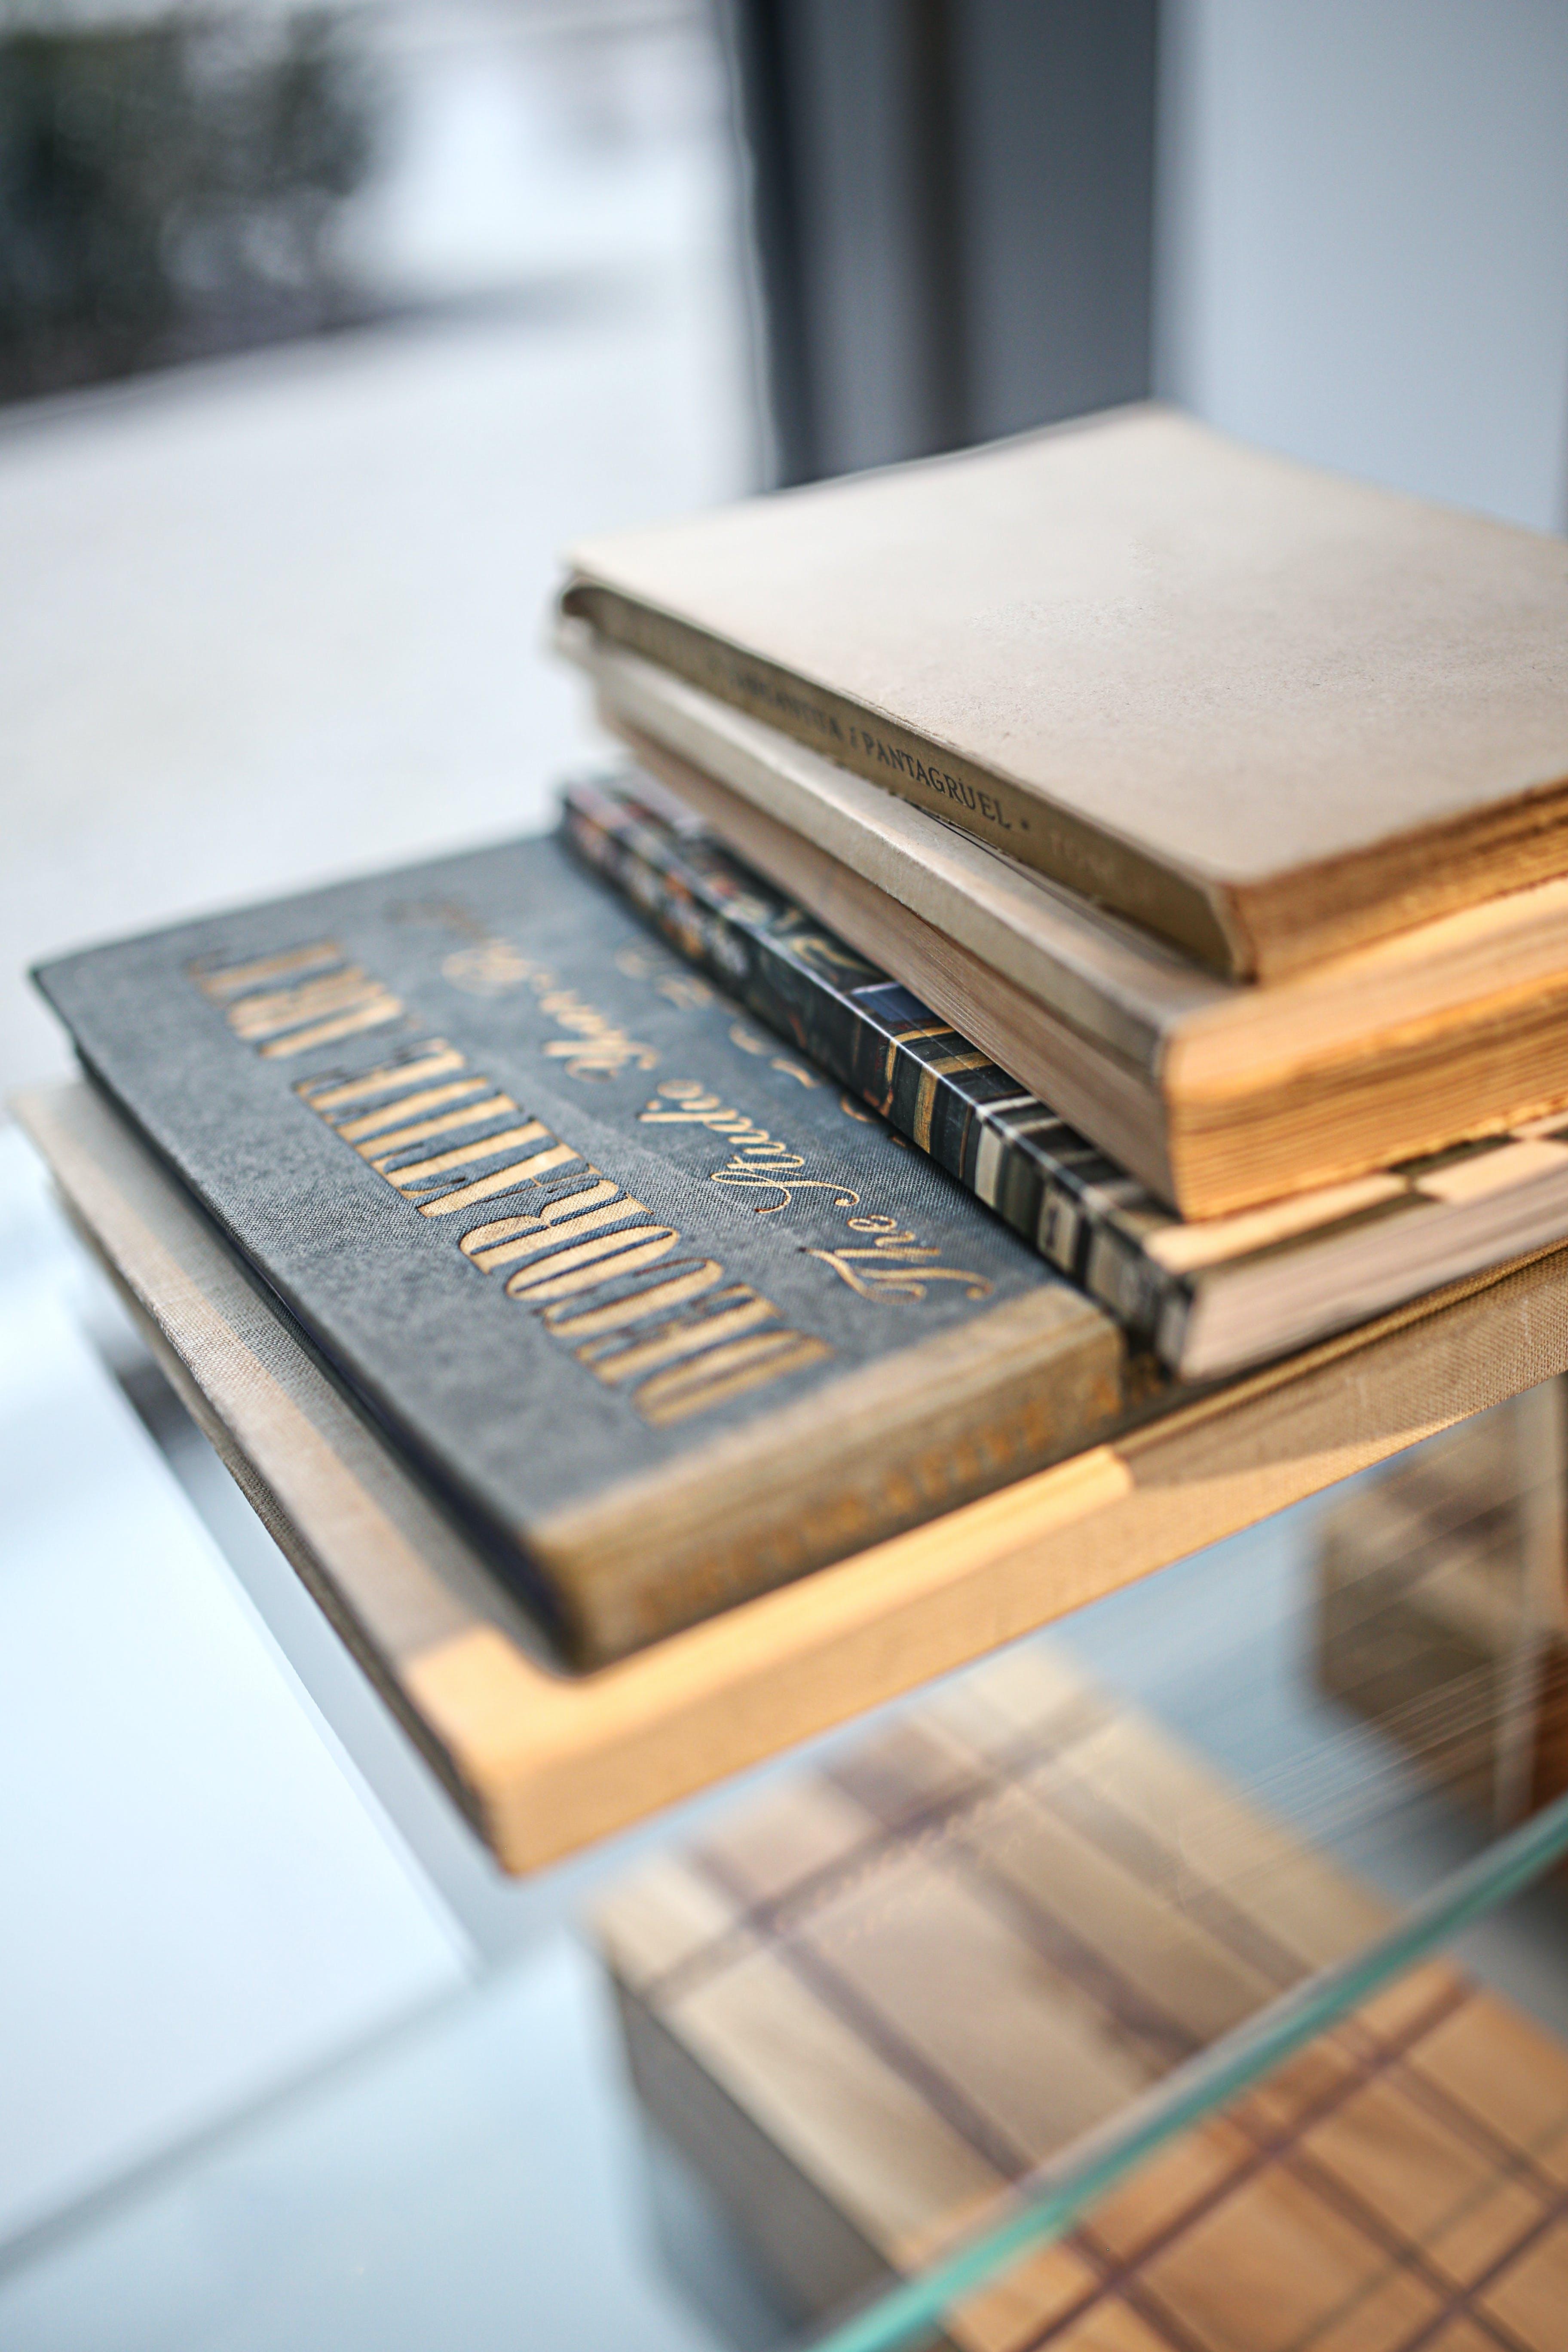 bibliothek, bücher